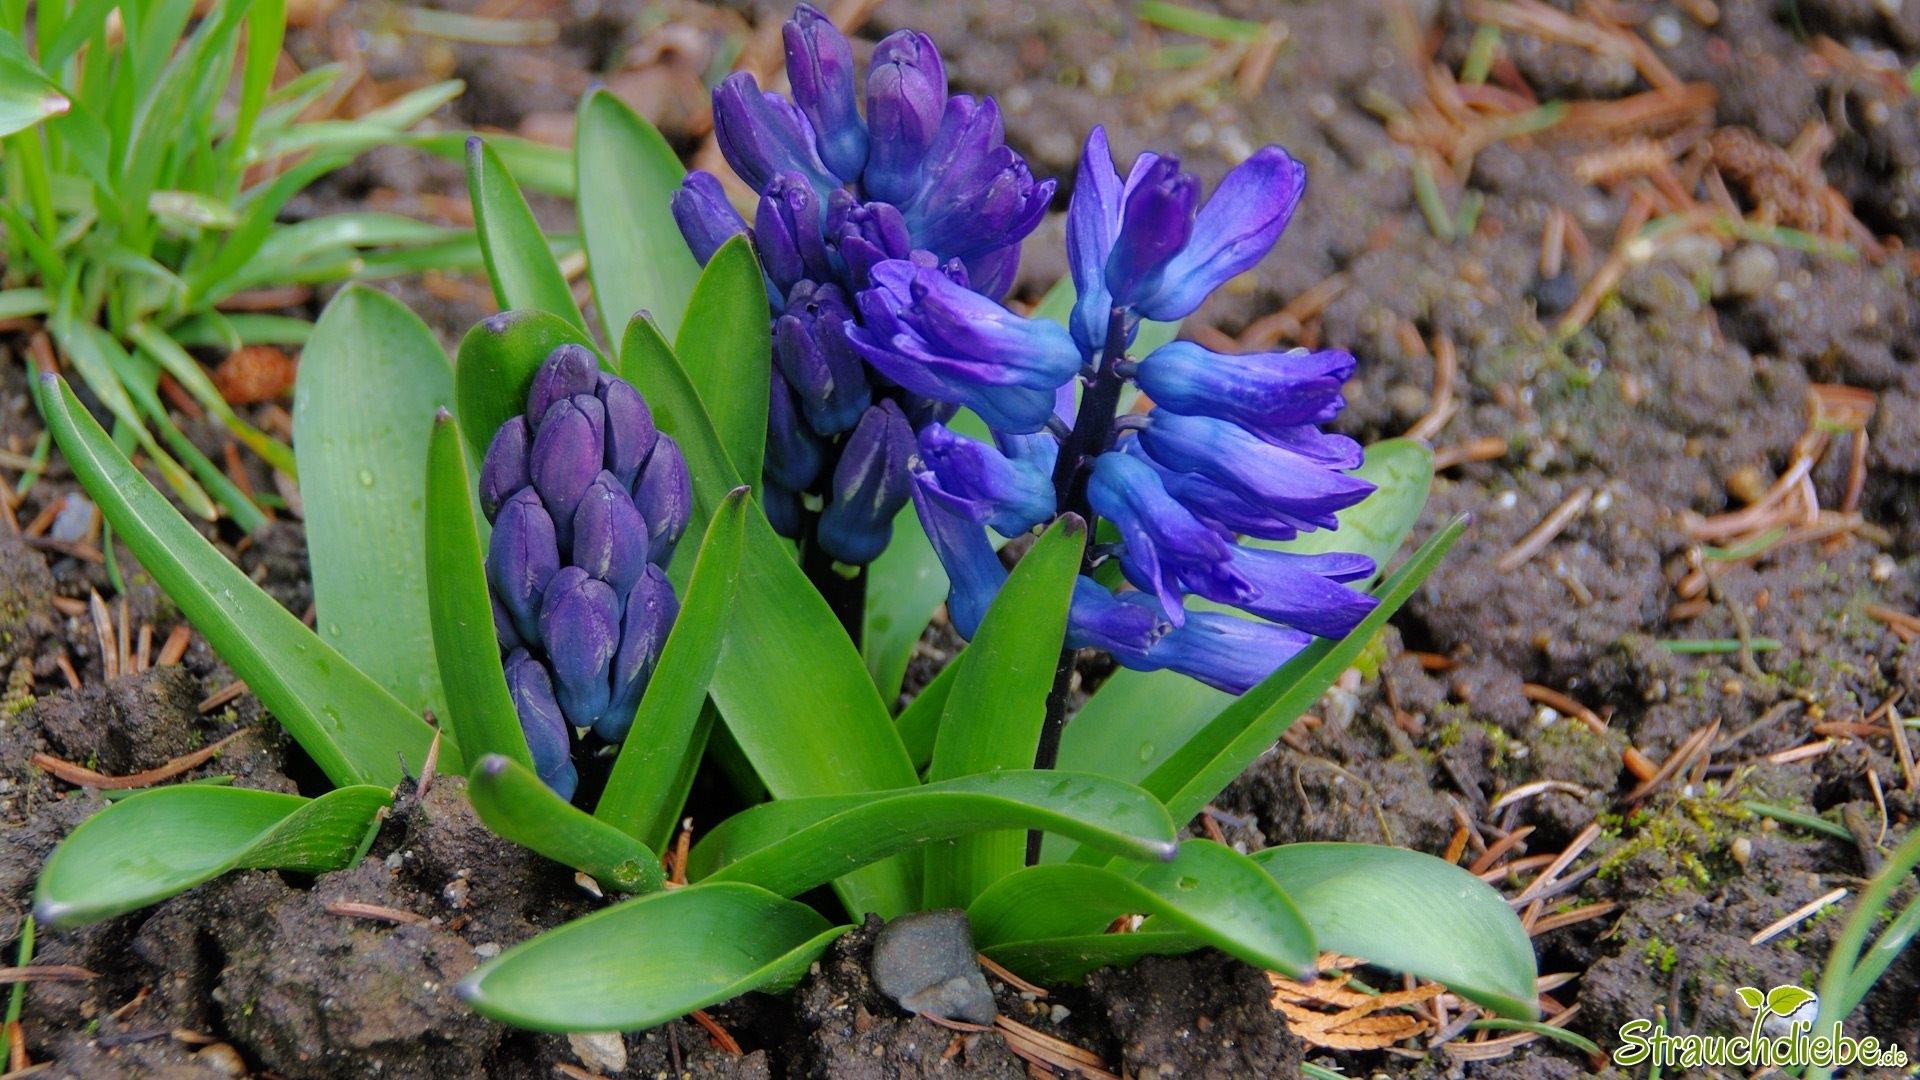 Hyazinthen (Hyacinthus)